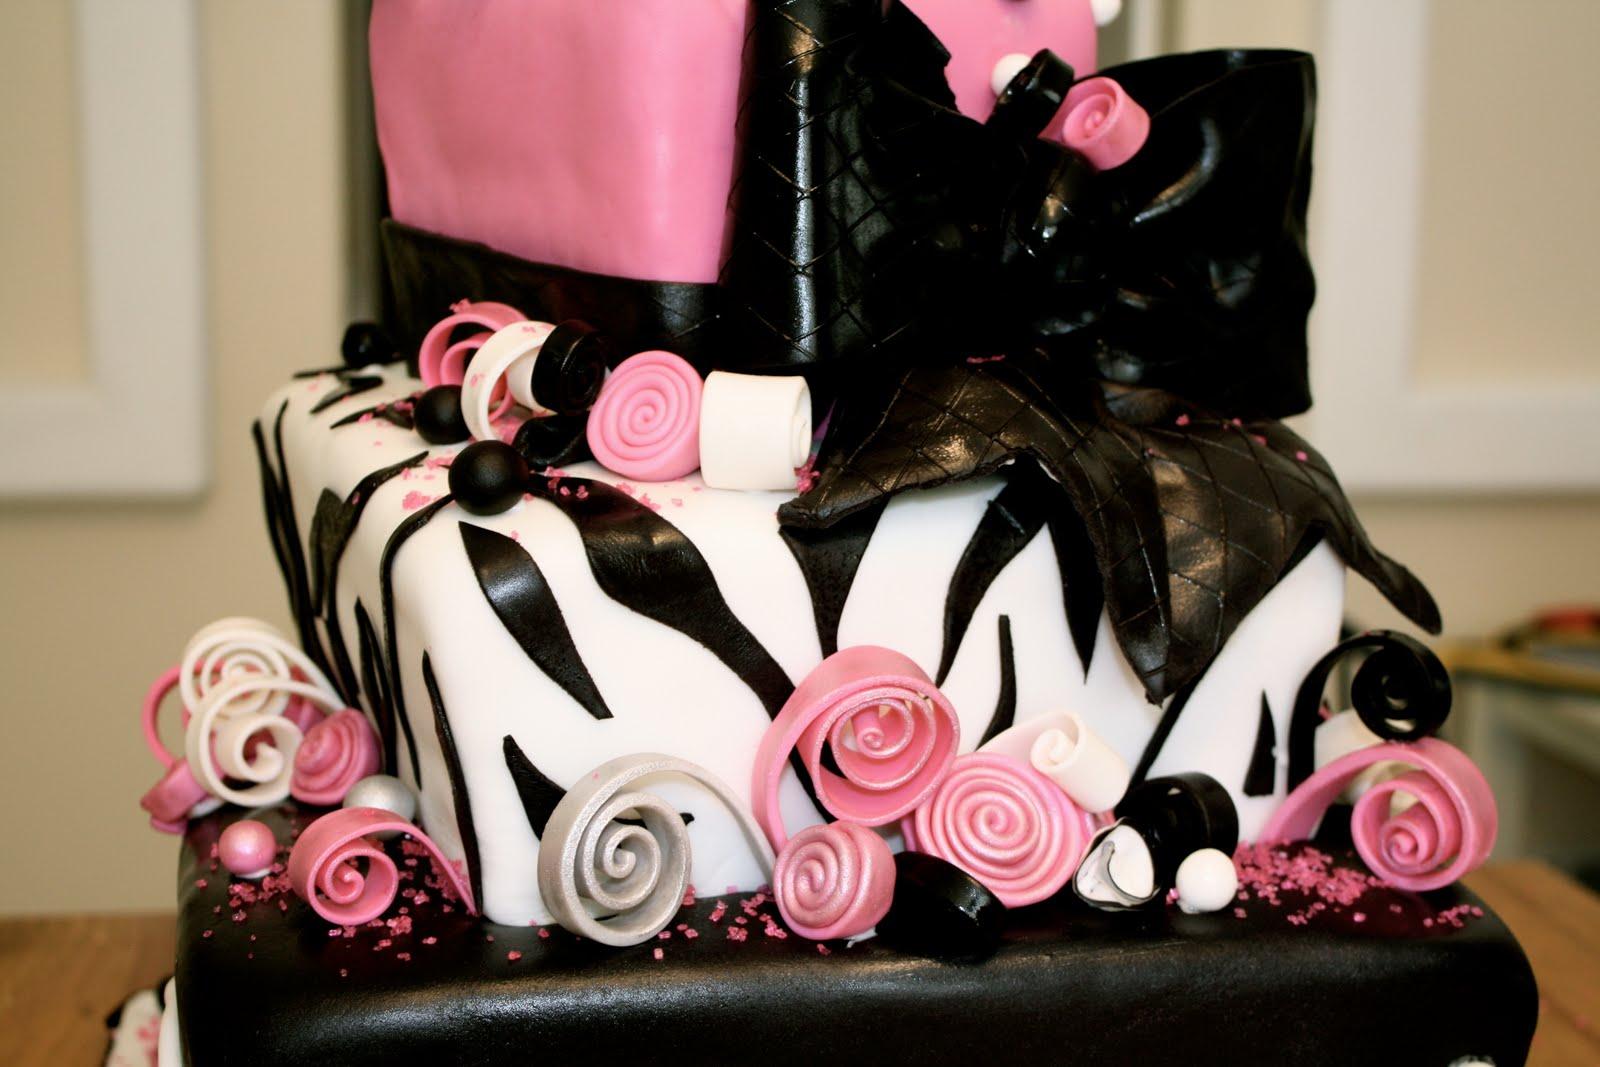 zebra print decorating ideas for birthday party bedroom decorating